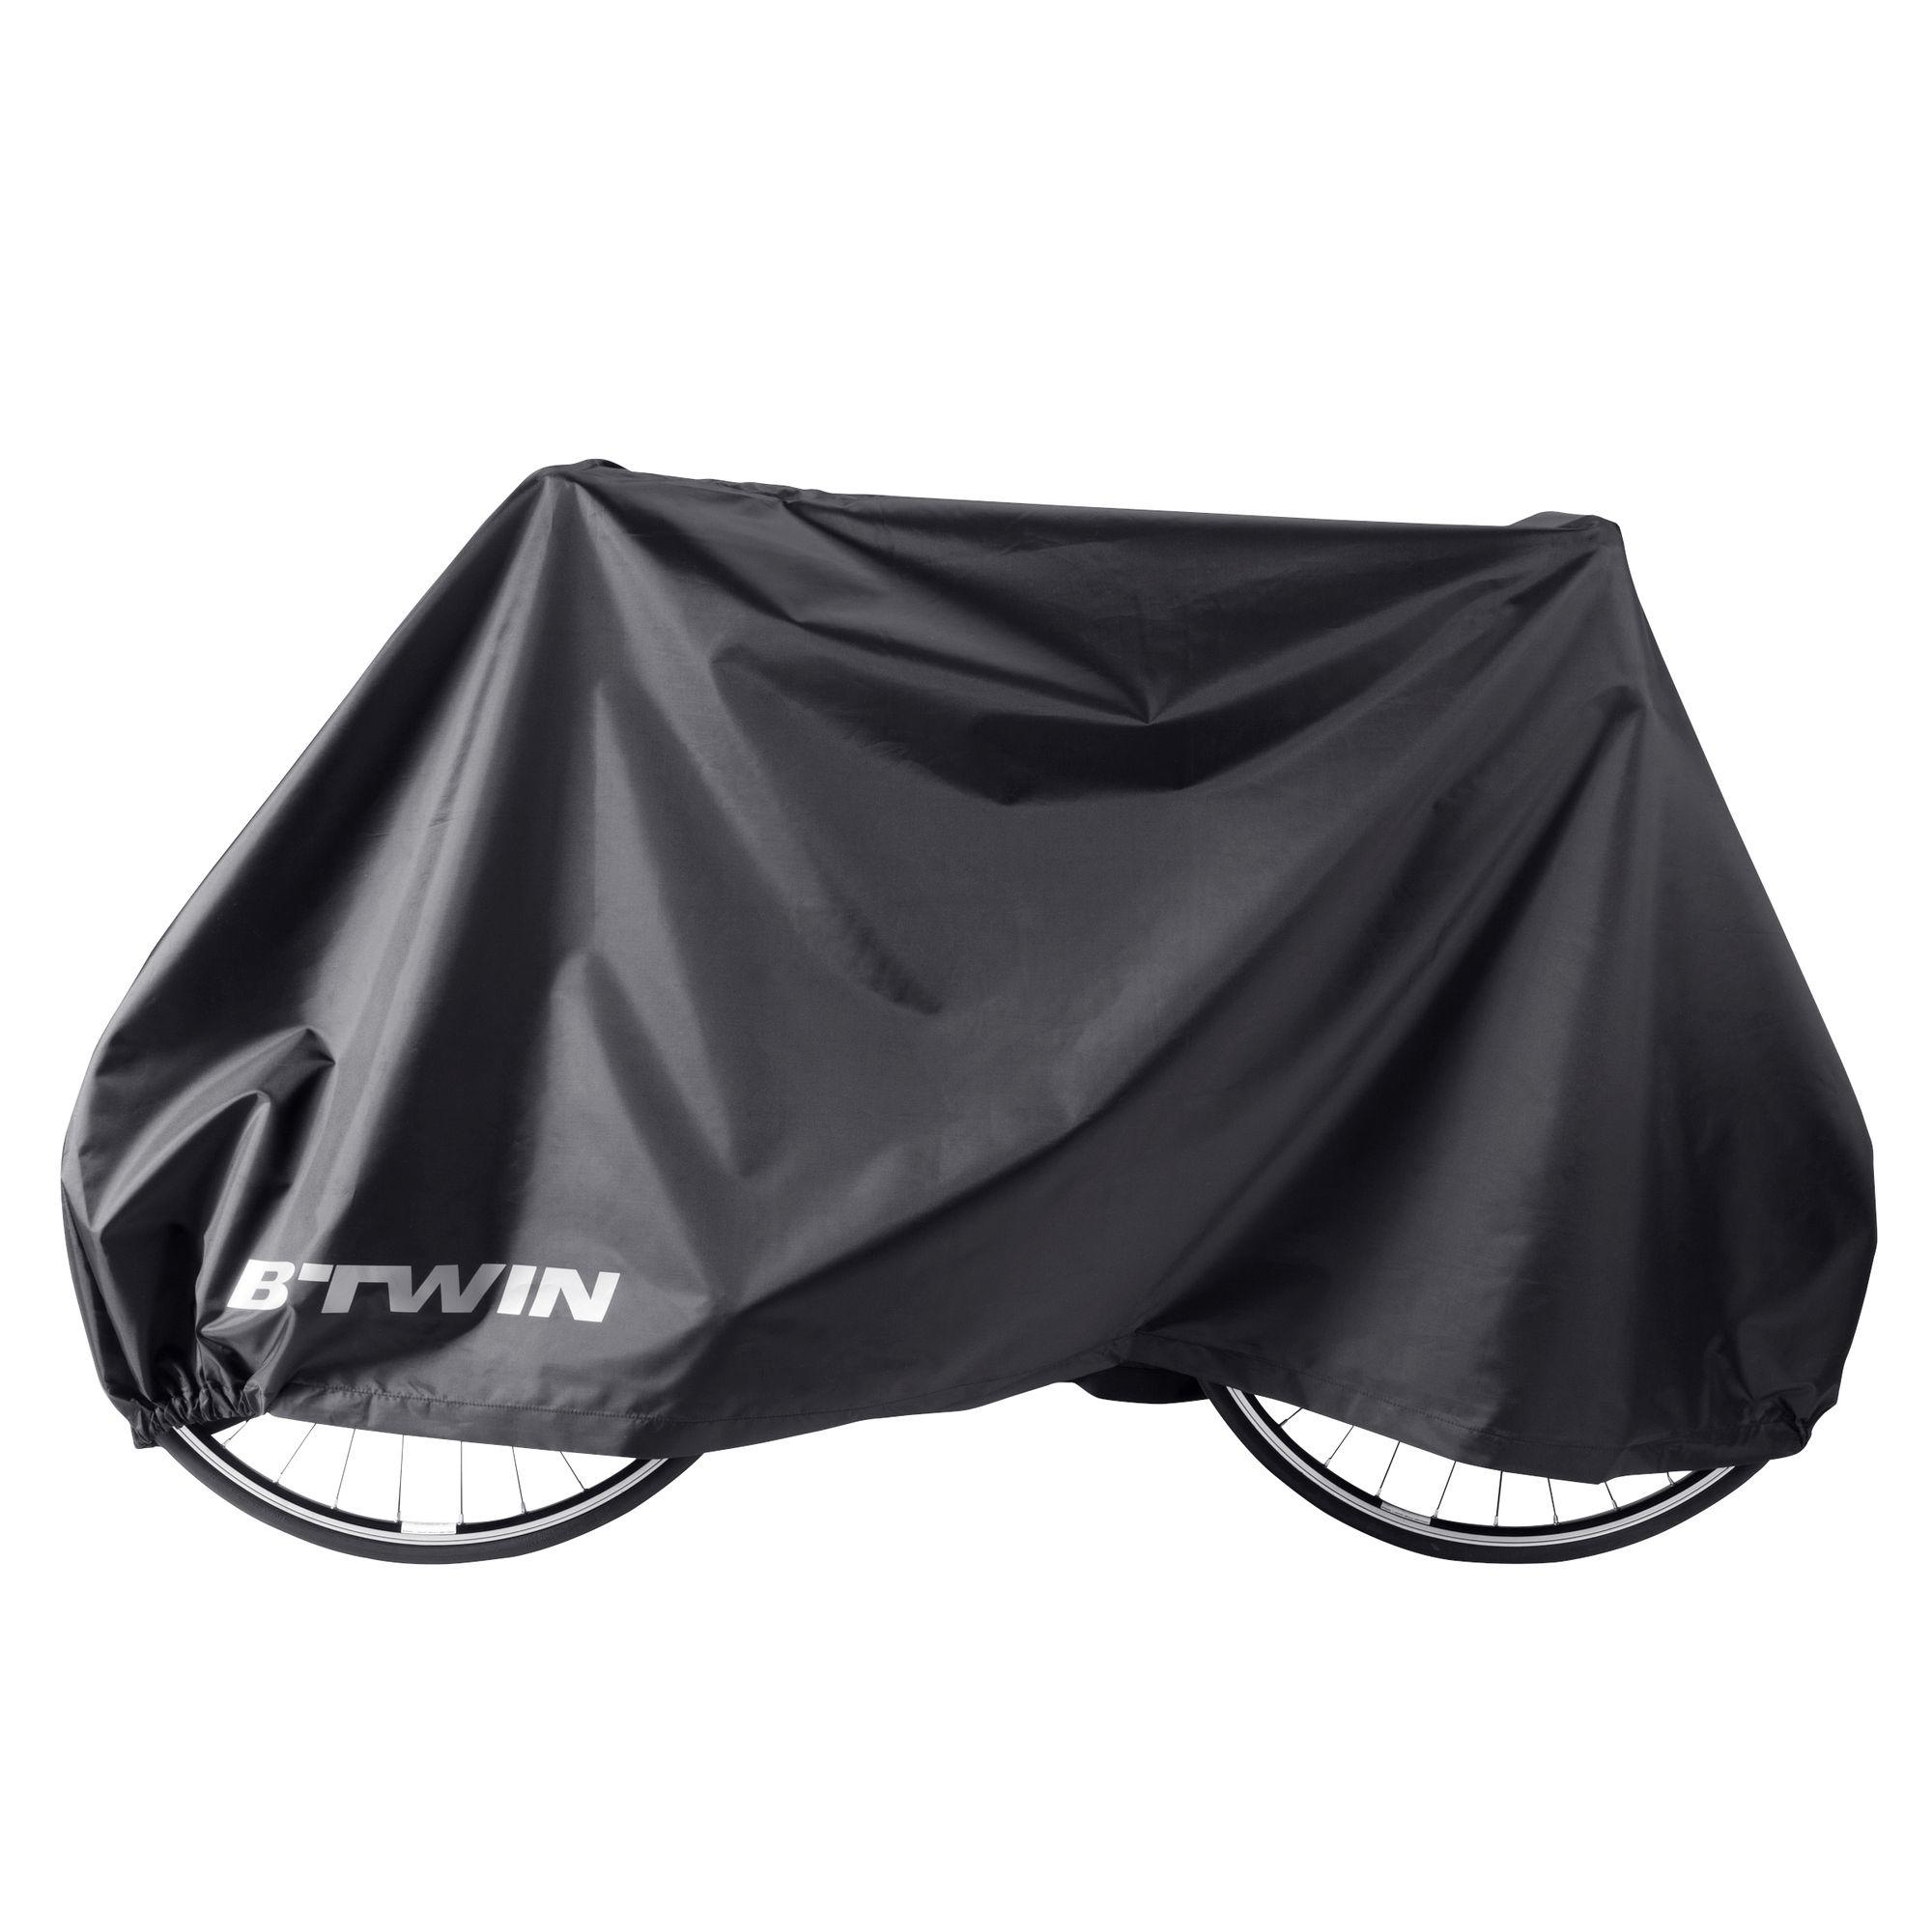 Protective Bike Cover